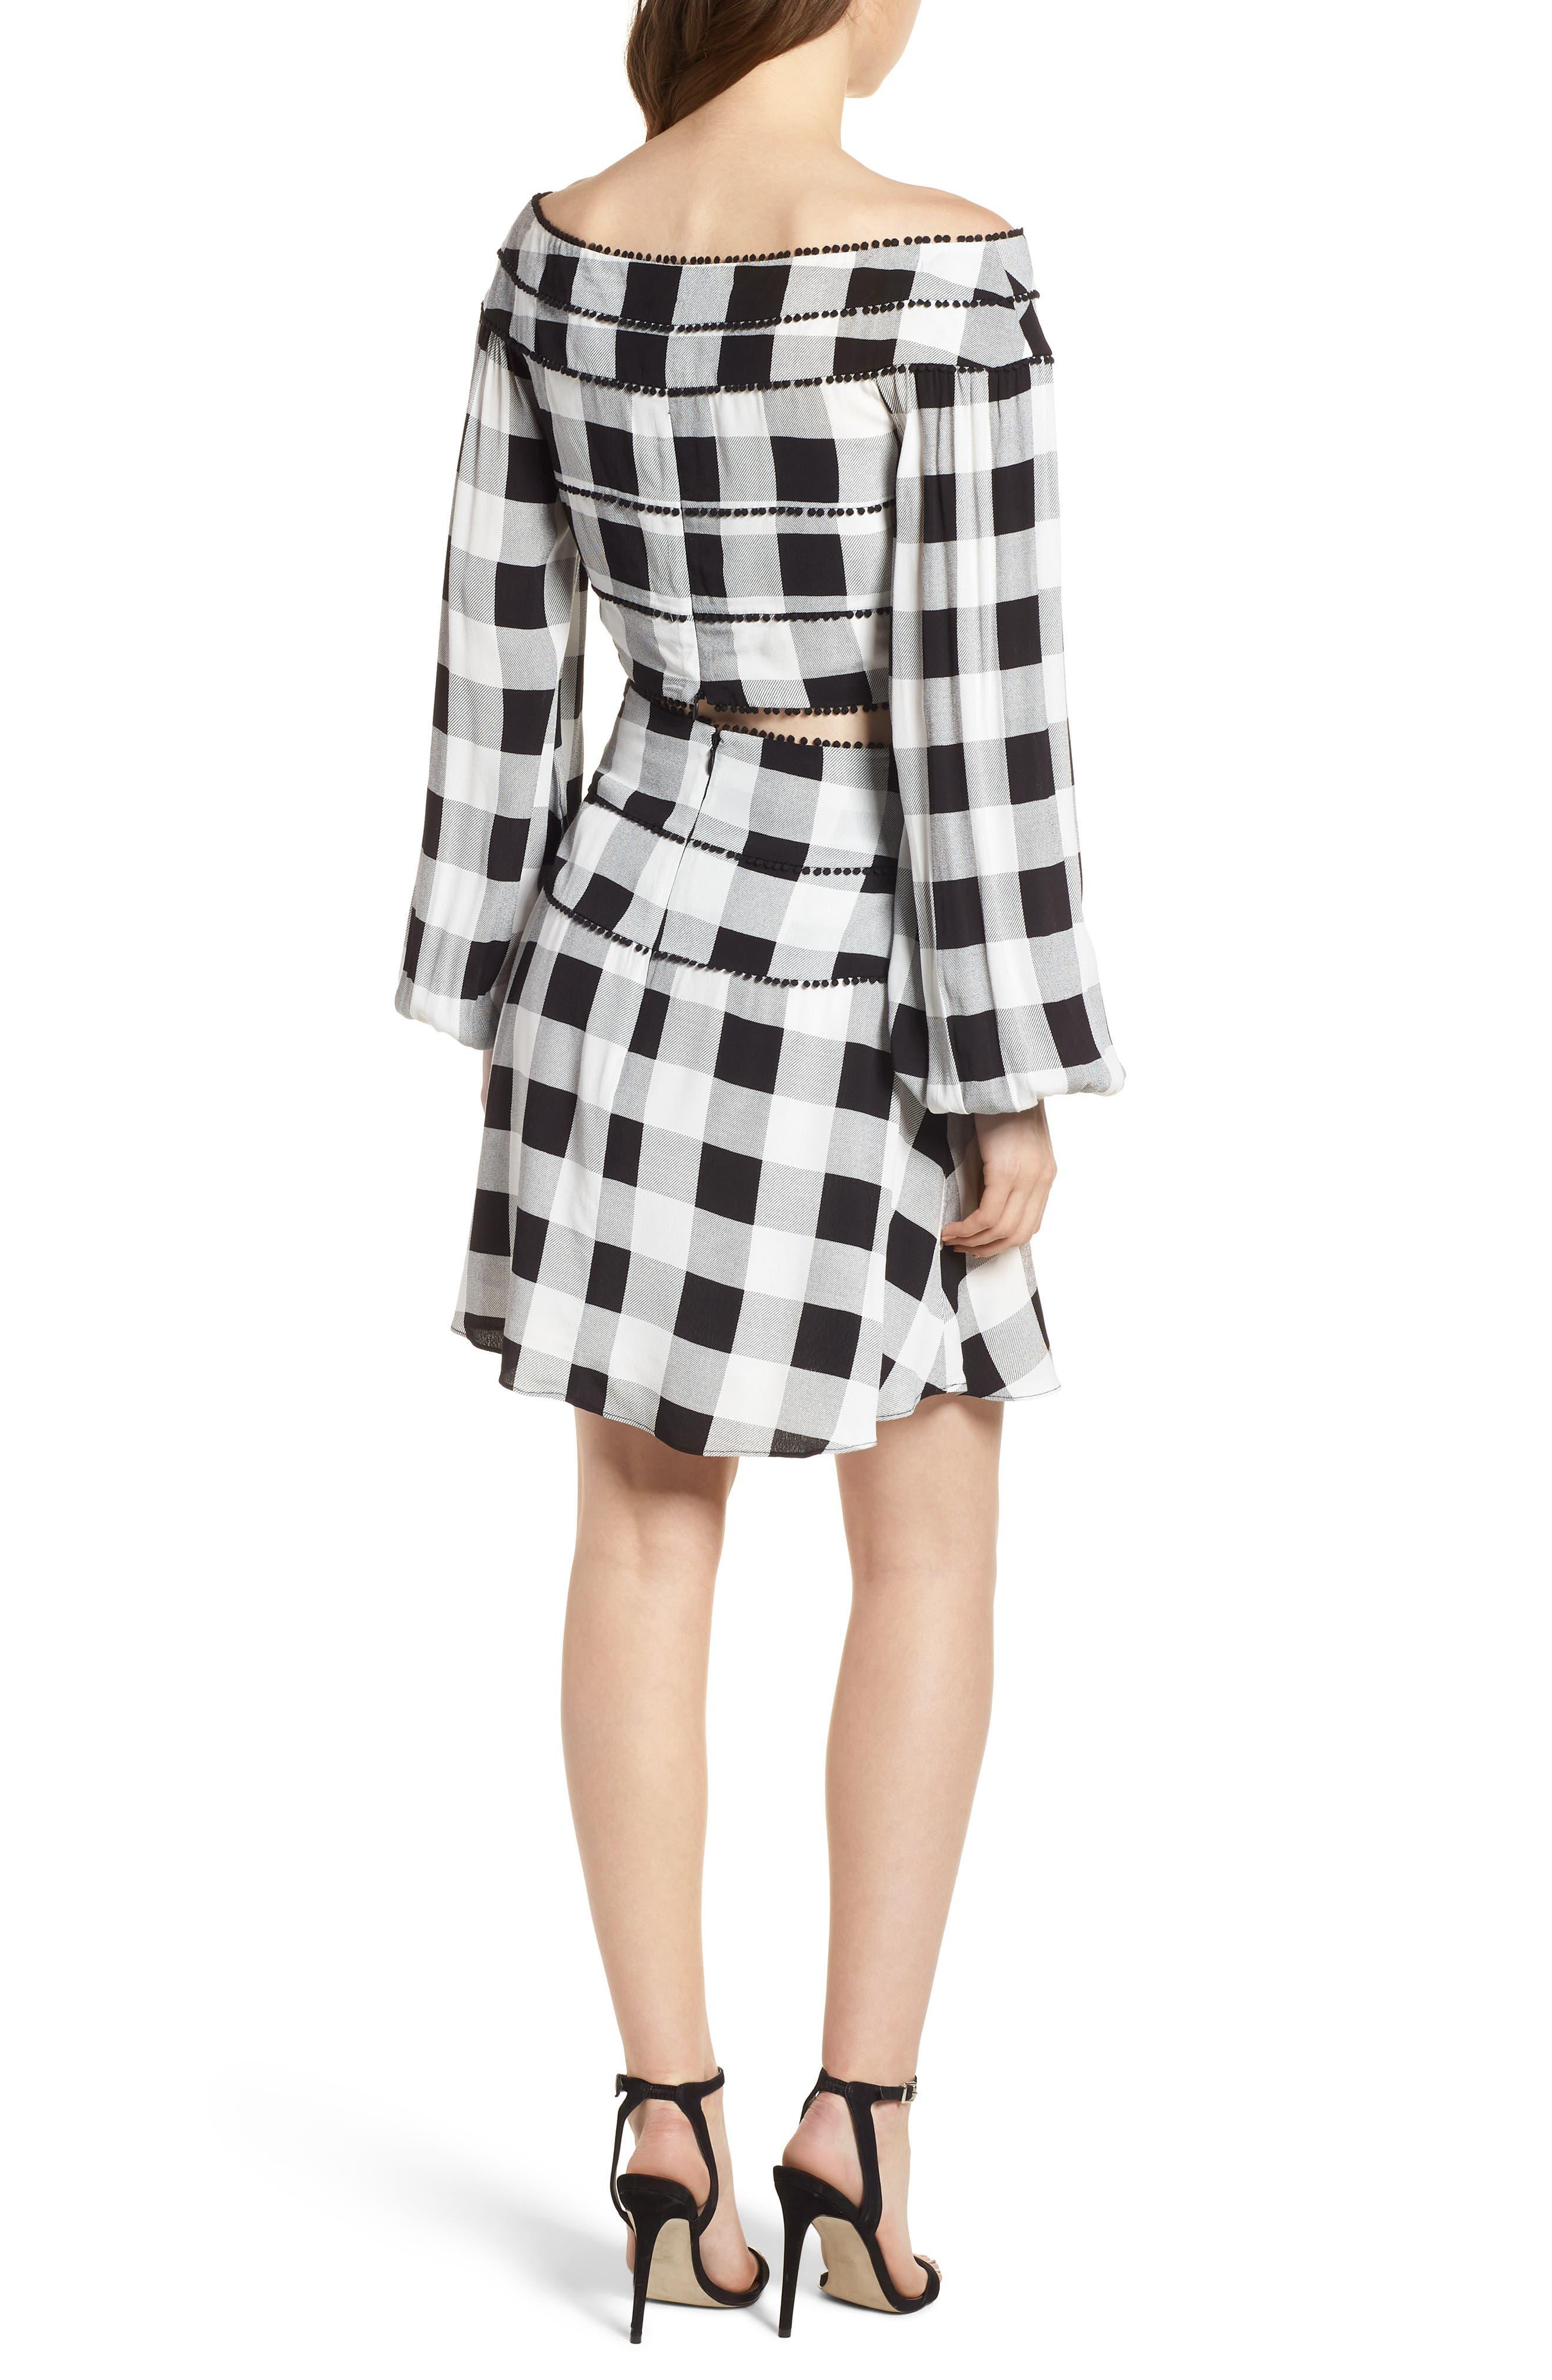 Bell High Waist Miniskirt,                             Alternate thumbnail 8, color,                             002